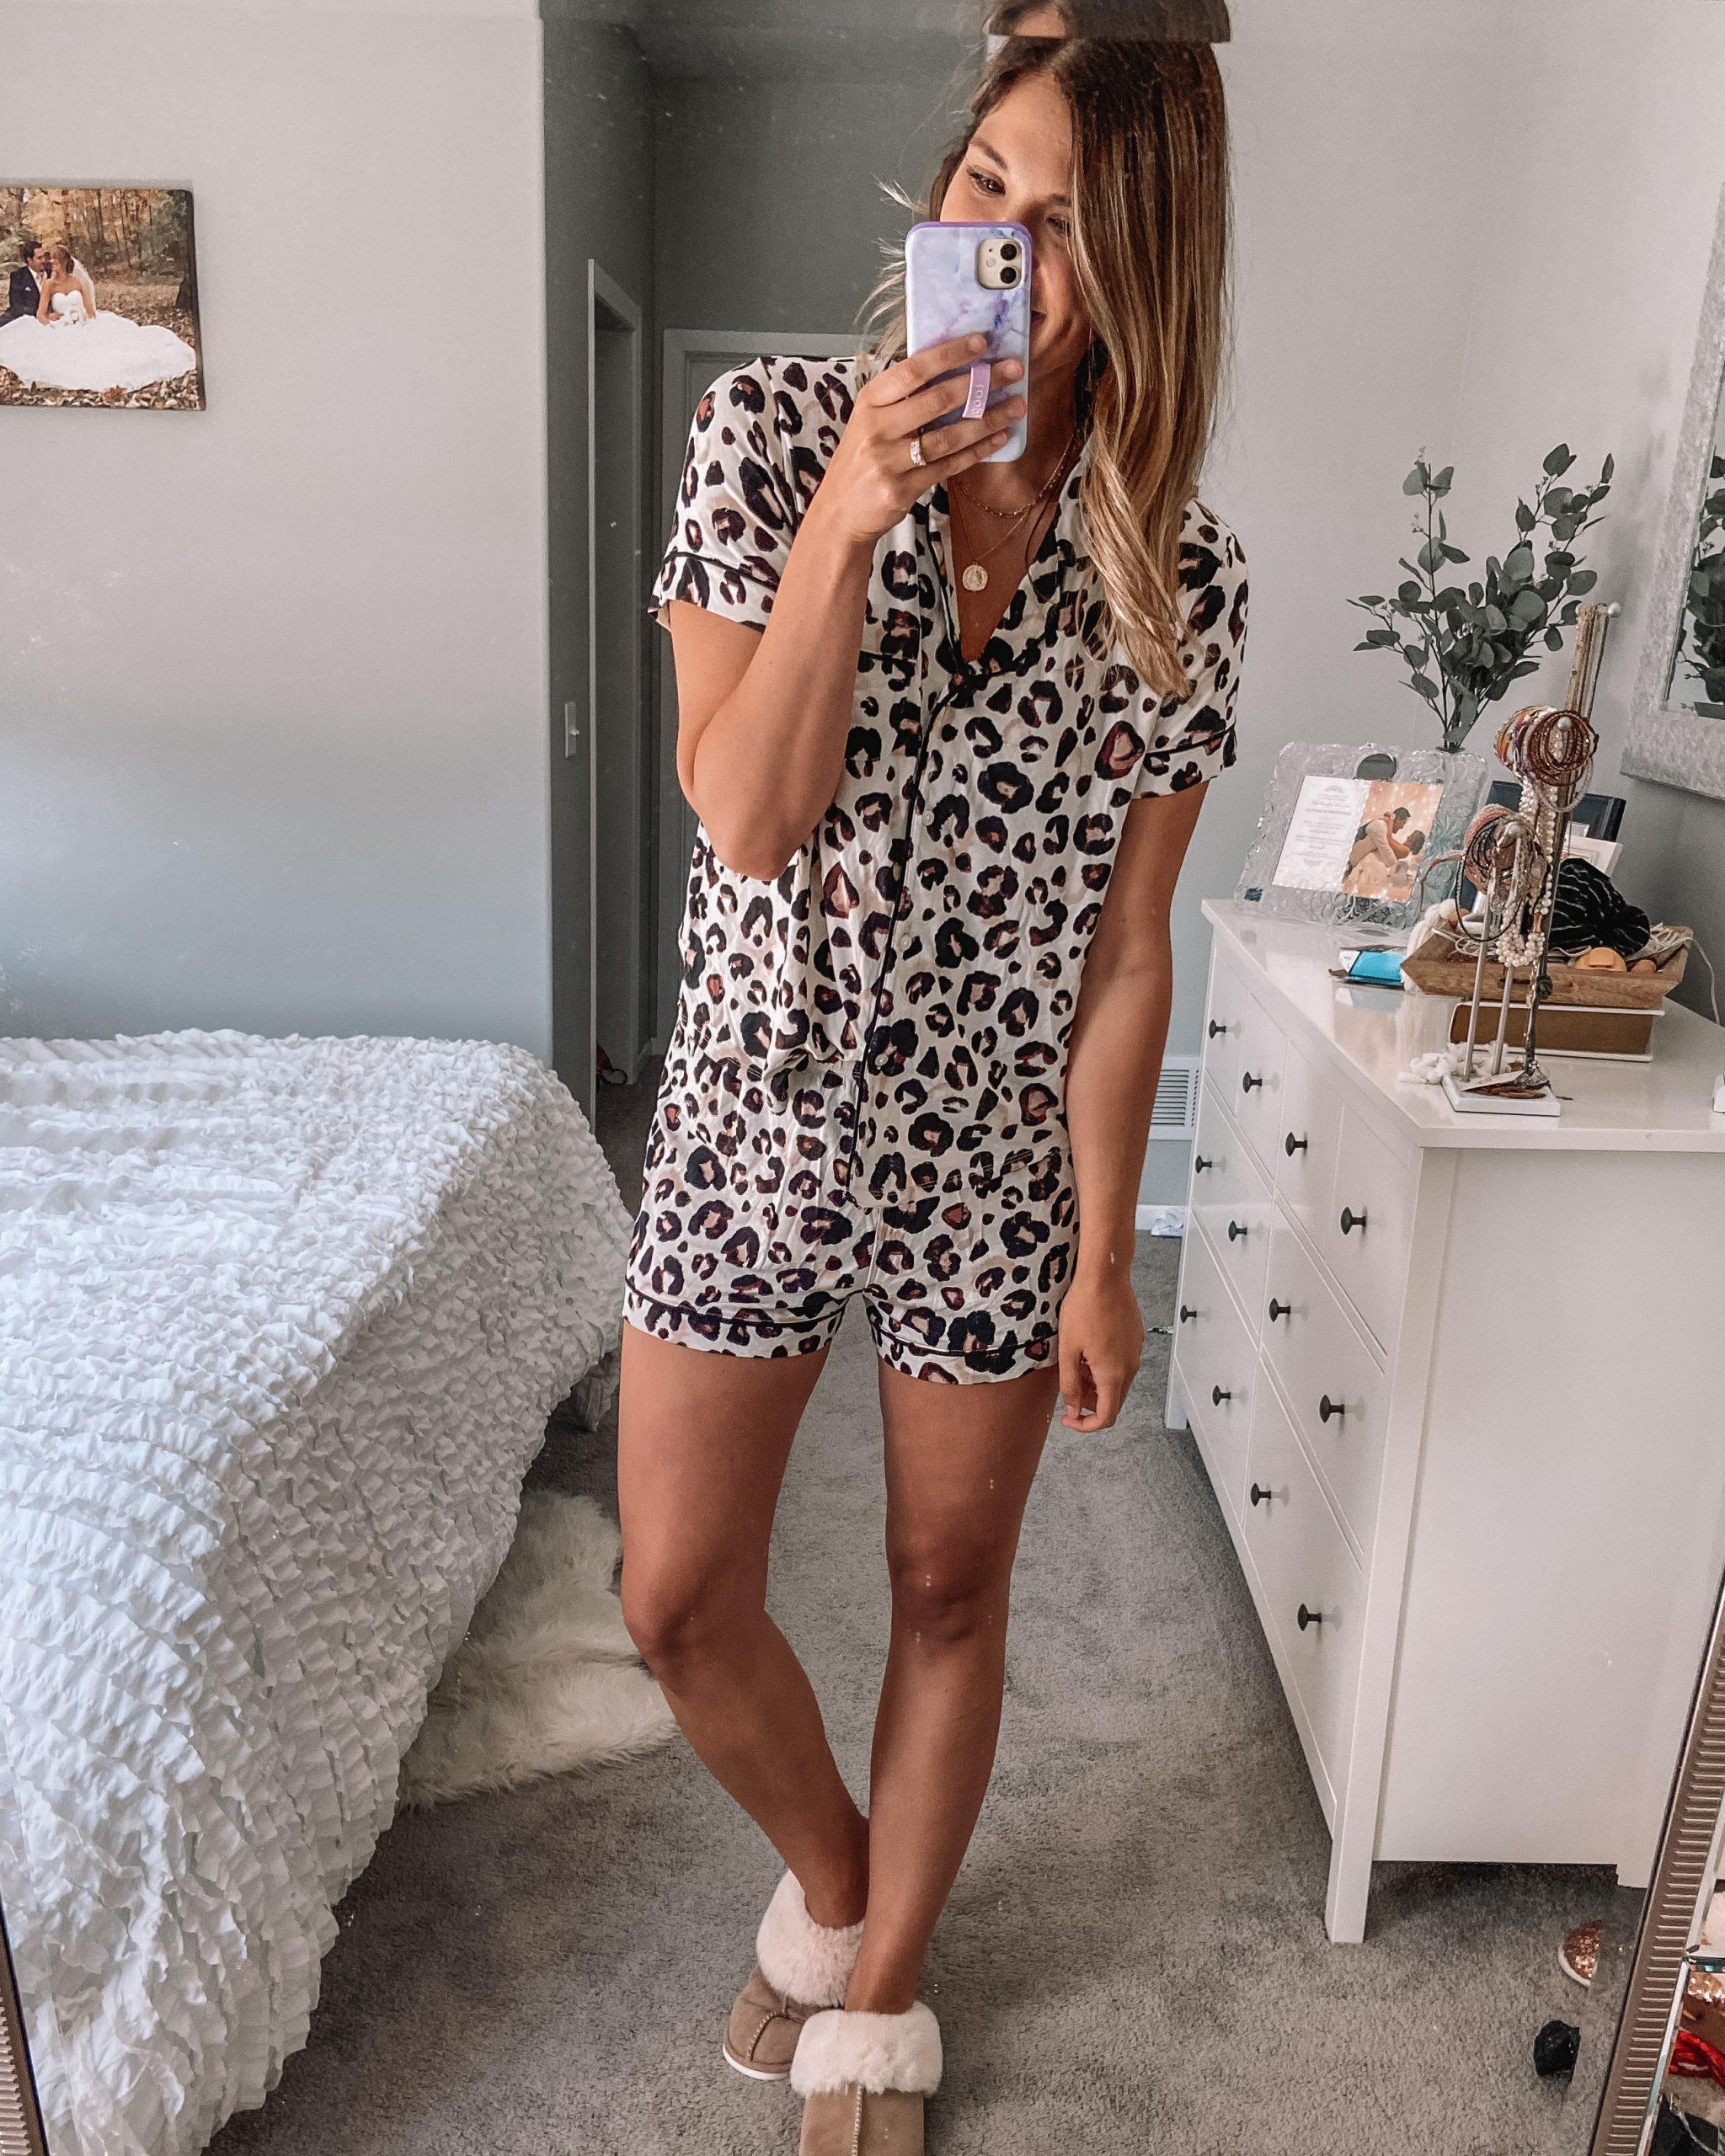 cheetah print pajamas and faux fur slippers